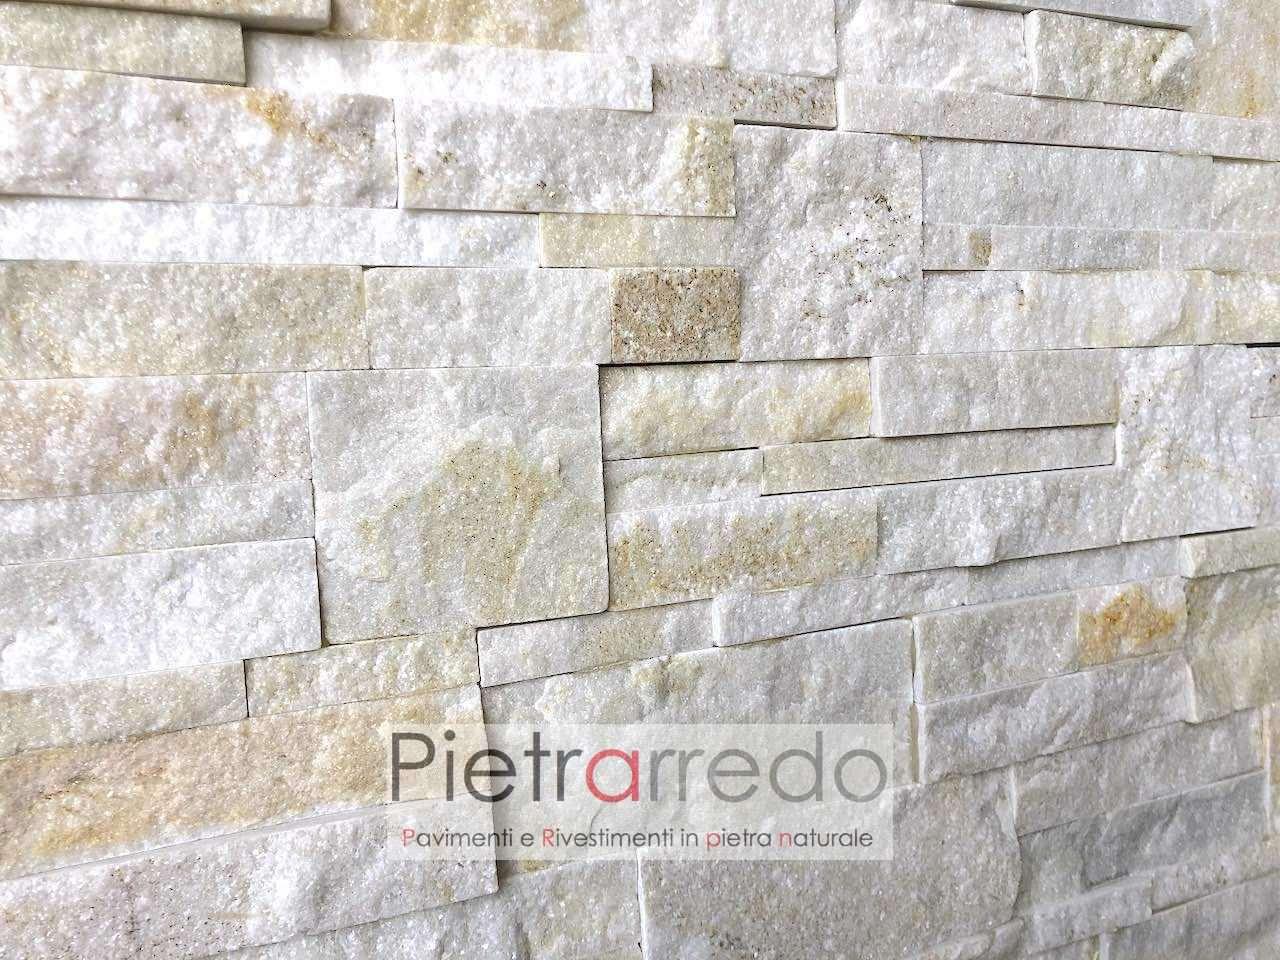 placche decorative in pietra quarzite beige scozzese in offerta su pietrarredo milano per muri facciate bonus italia 2020 incentivi